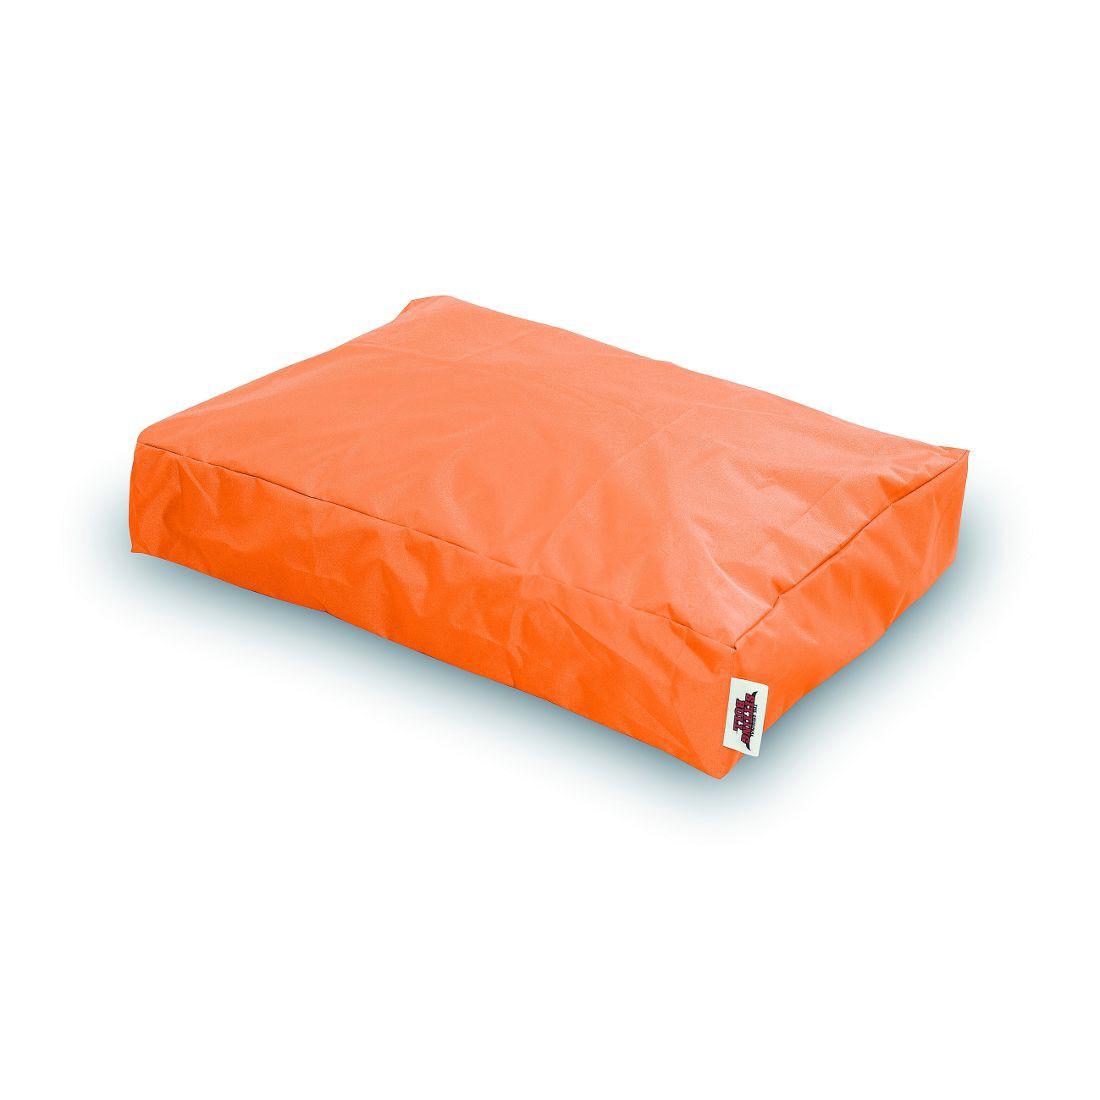 Sitzsack Pet Bull S – orange, Sitting Bull jetzt kaufen